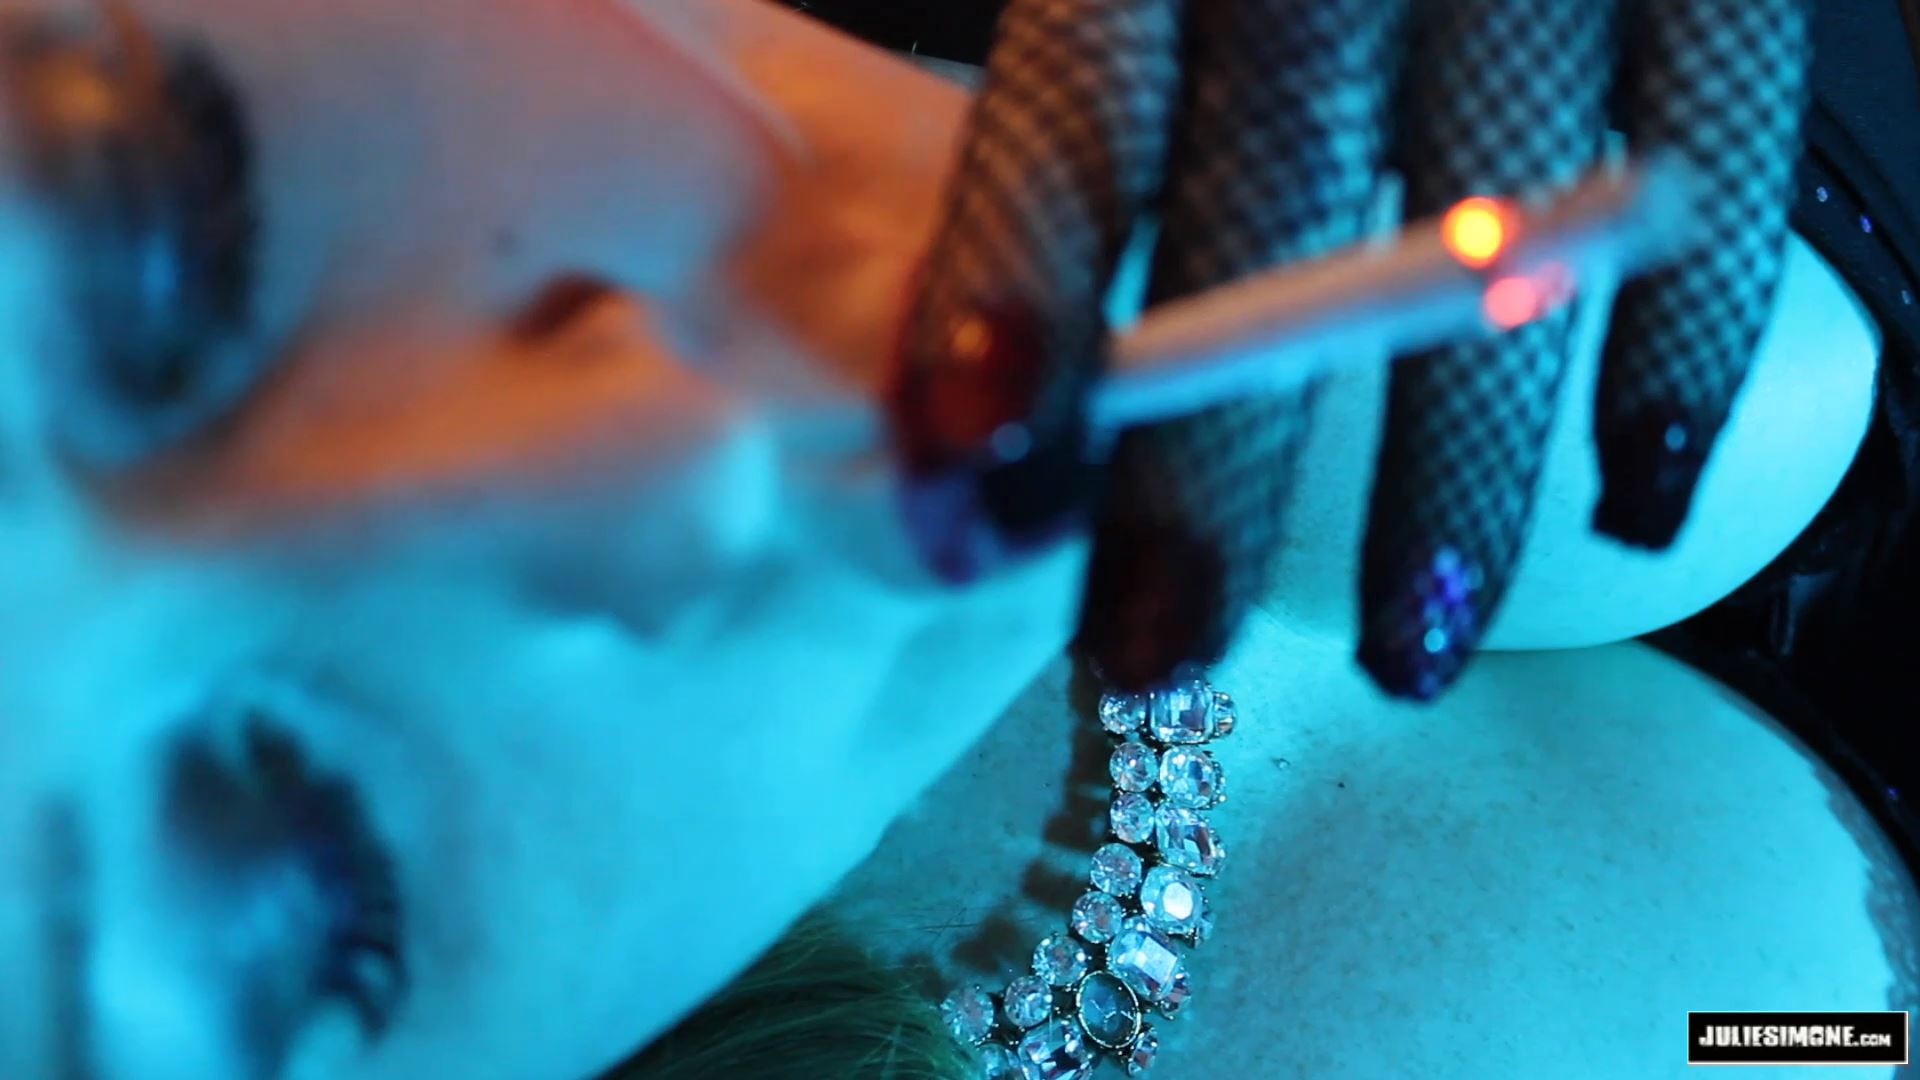 Julie Simone In Scene: Smoking Dunhills in Fishnet Gloves - JULIESIMONE - FULL HD/1080p/MP4